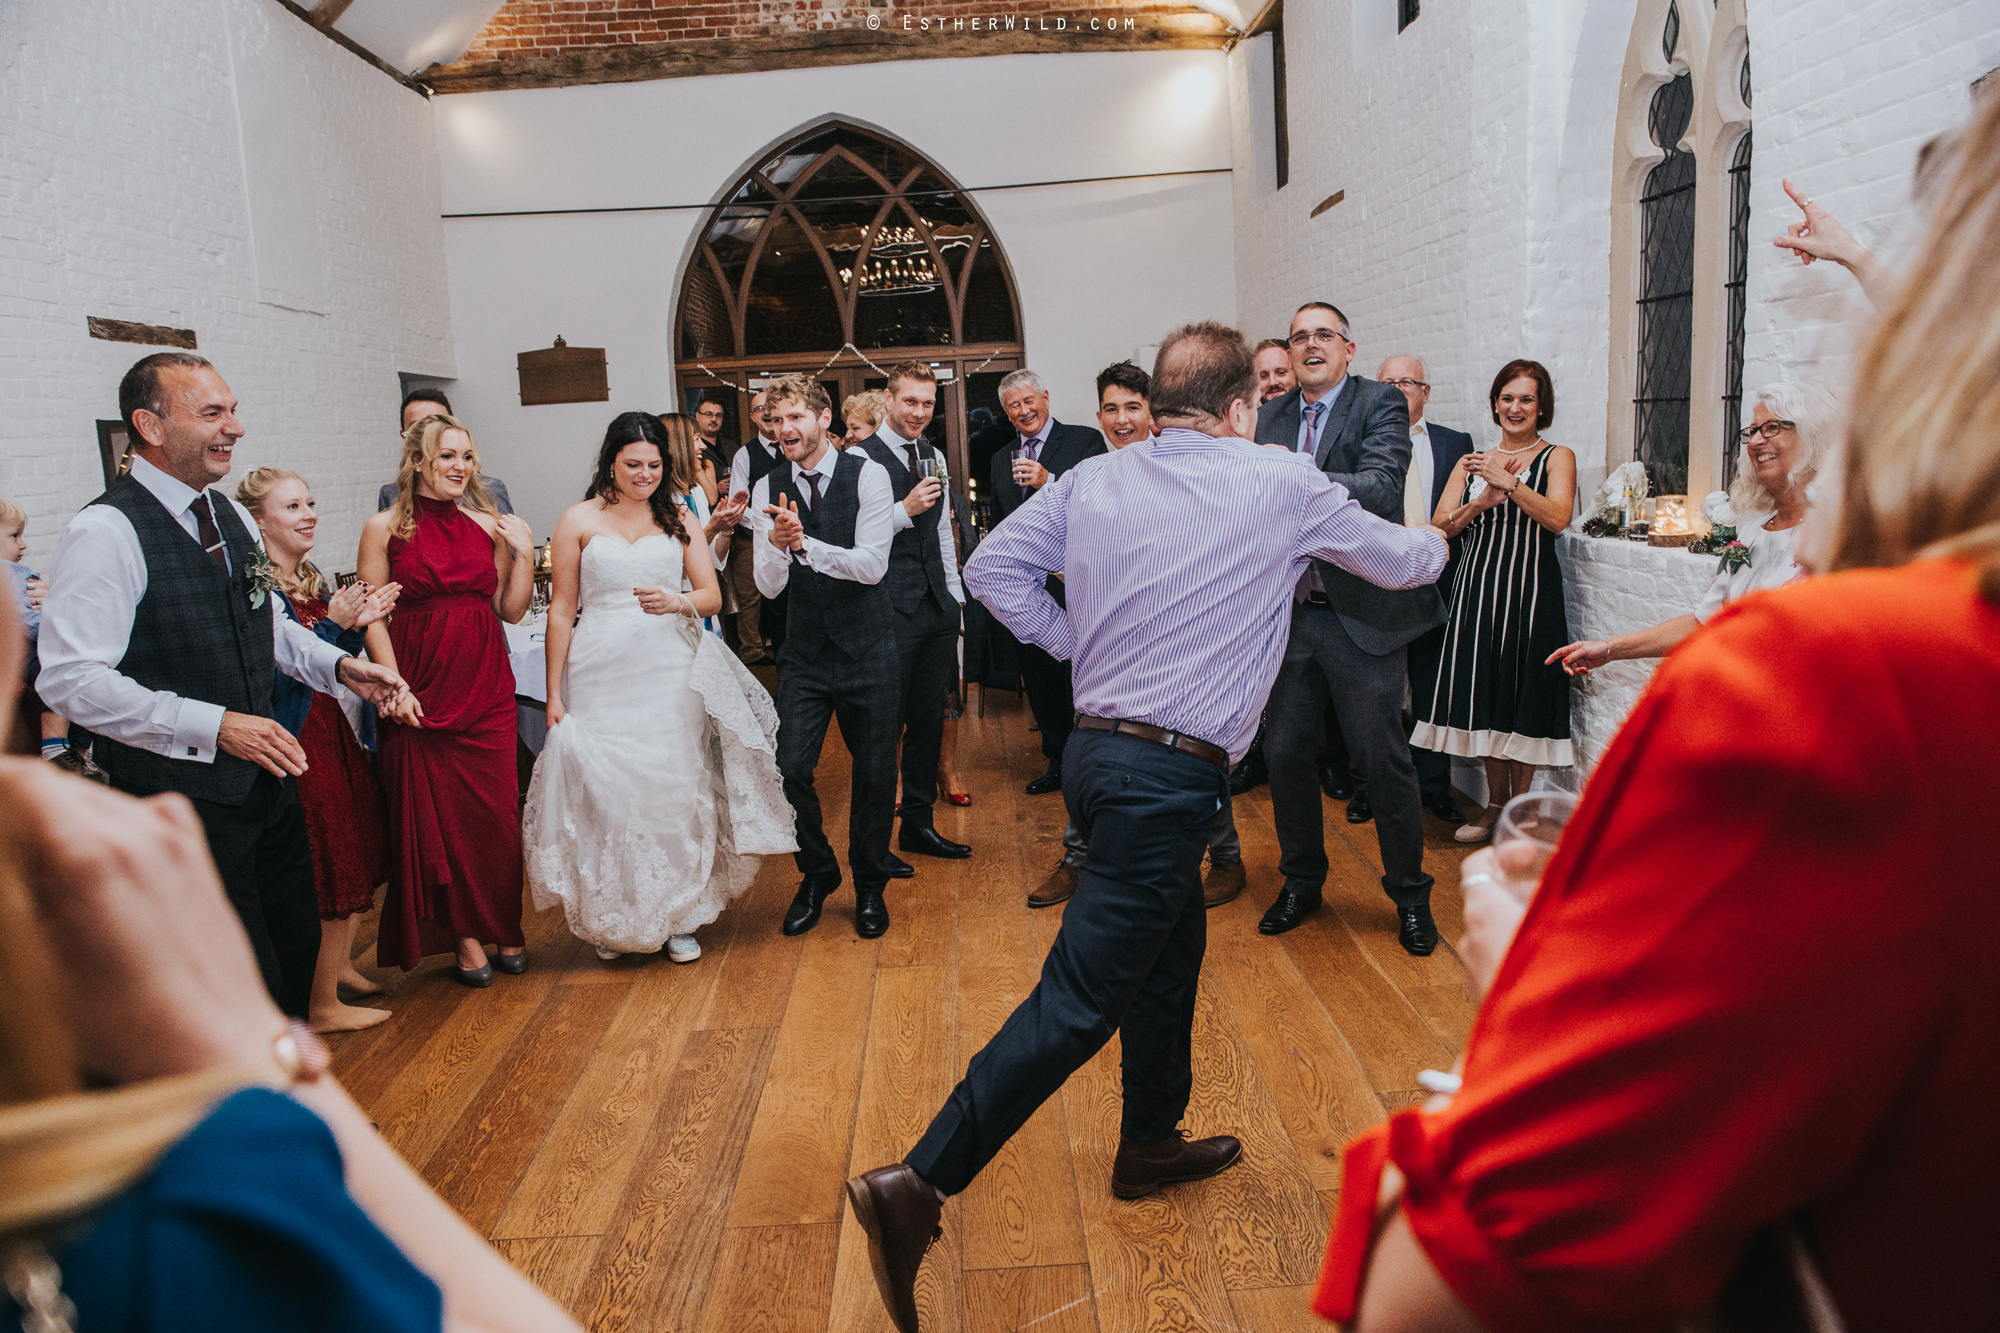 Reading_Room_Weddings_Alby_Norwich_Photographer_Esther_Wild_IMG_3951.jpg